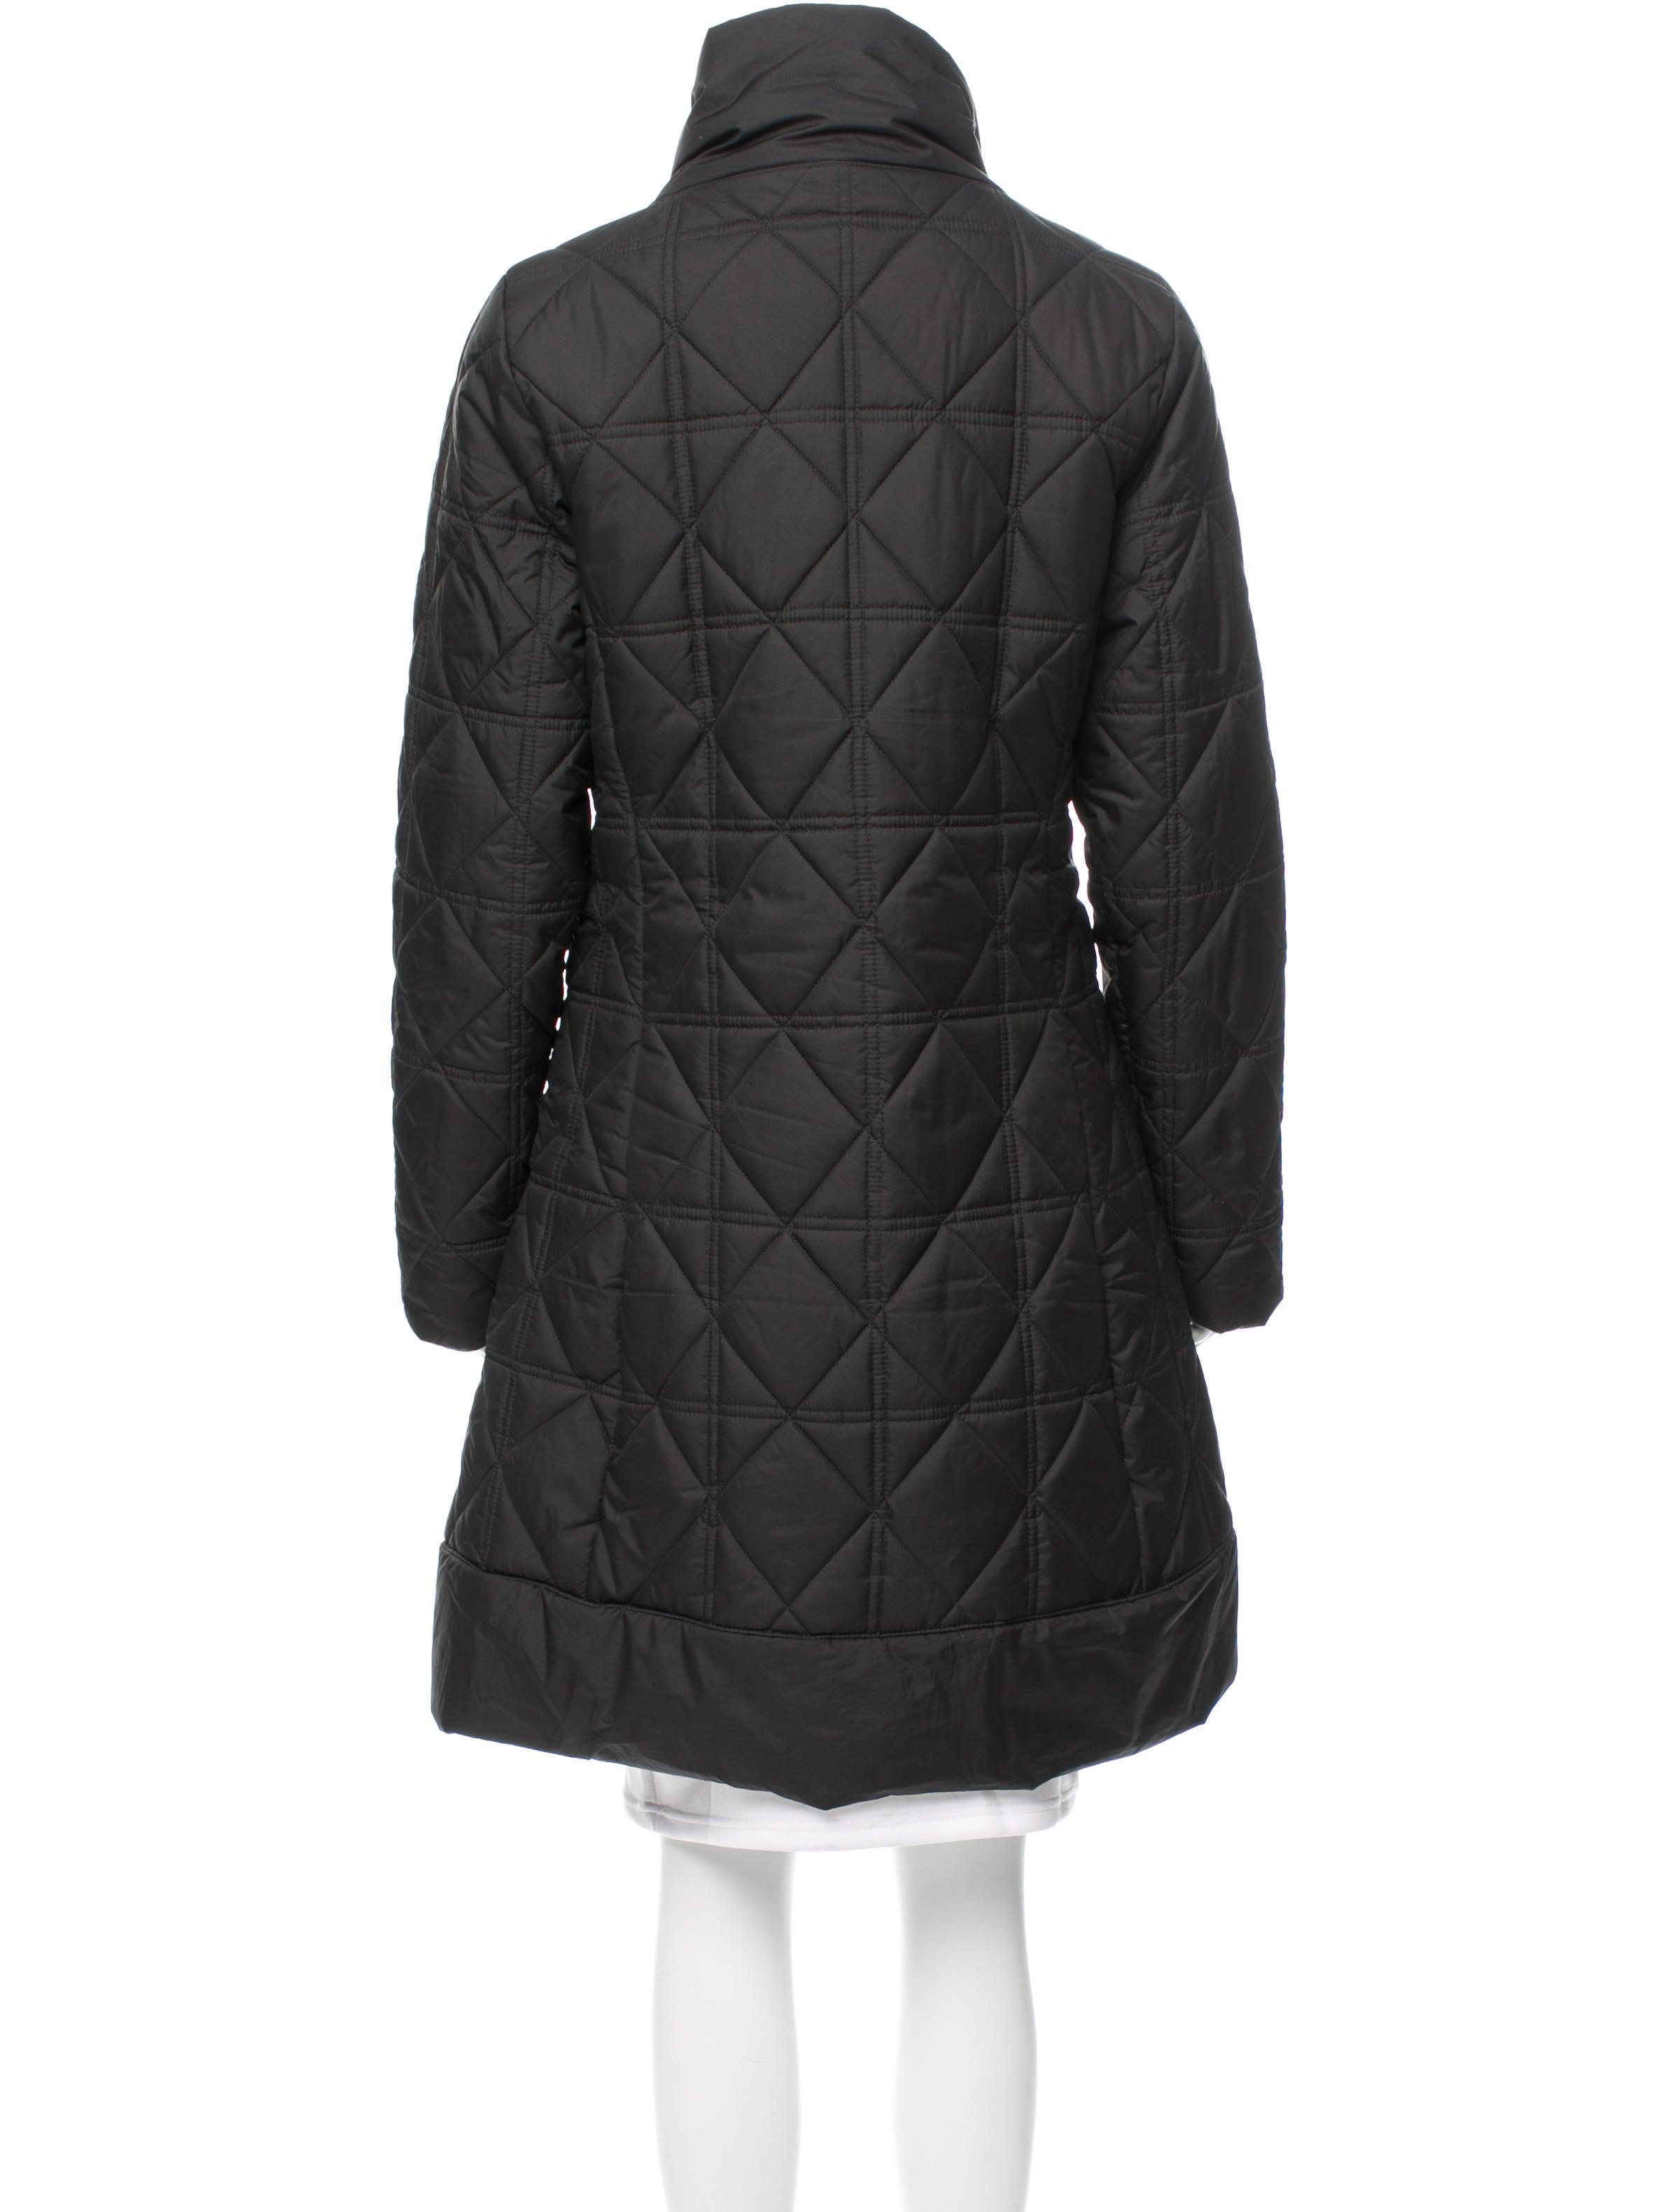 Patagonia Knee Length Puffer Coat Clothing Wpatg20012